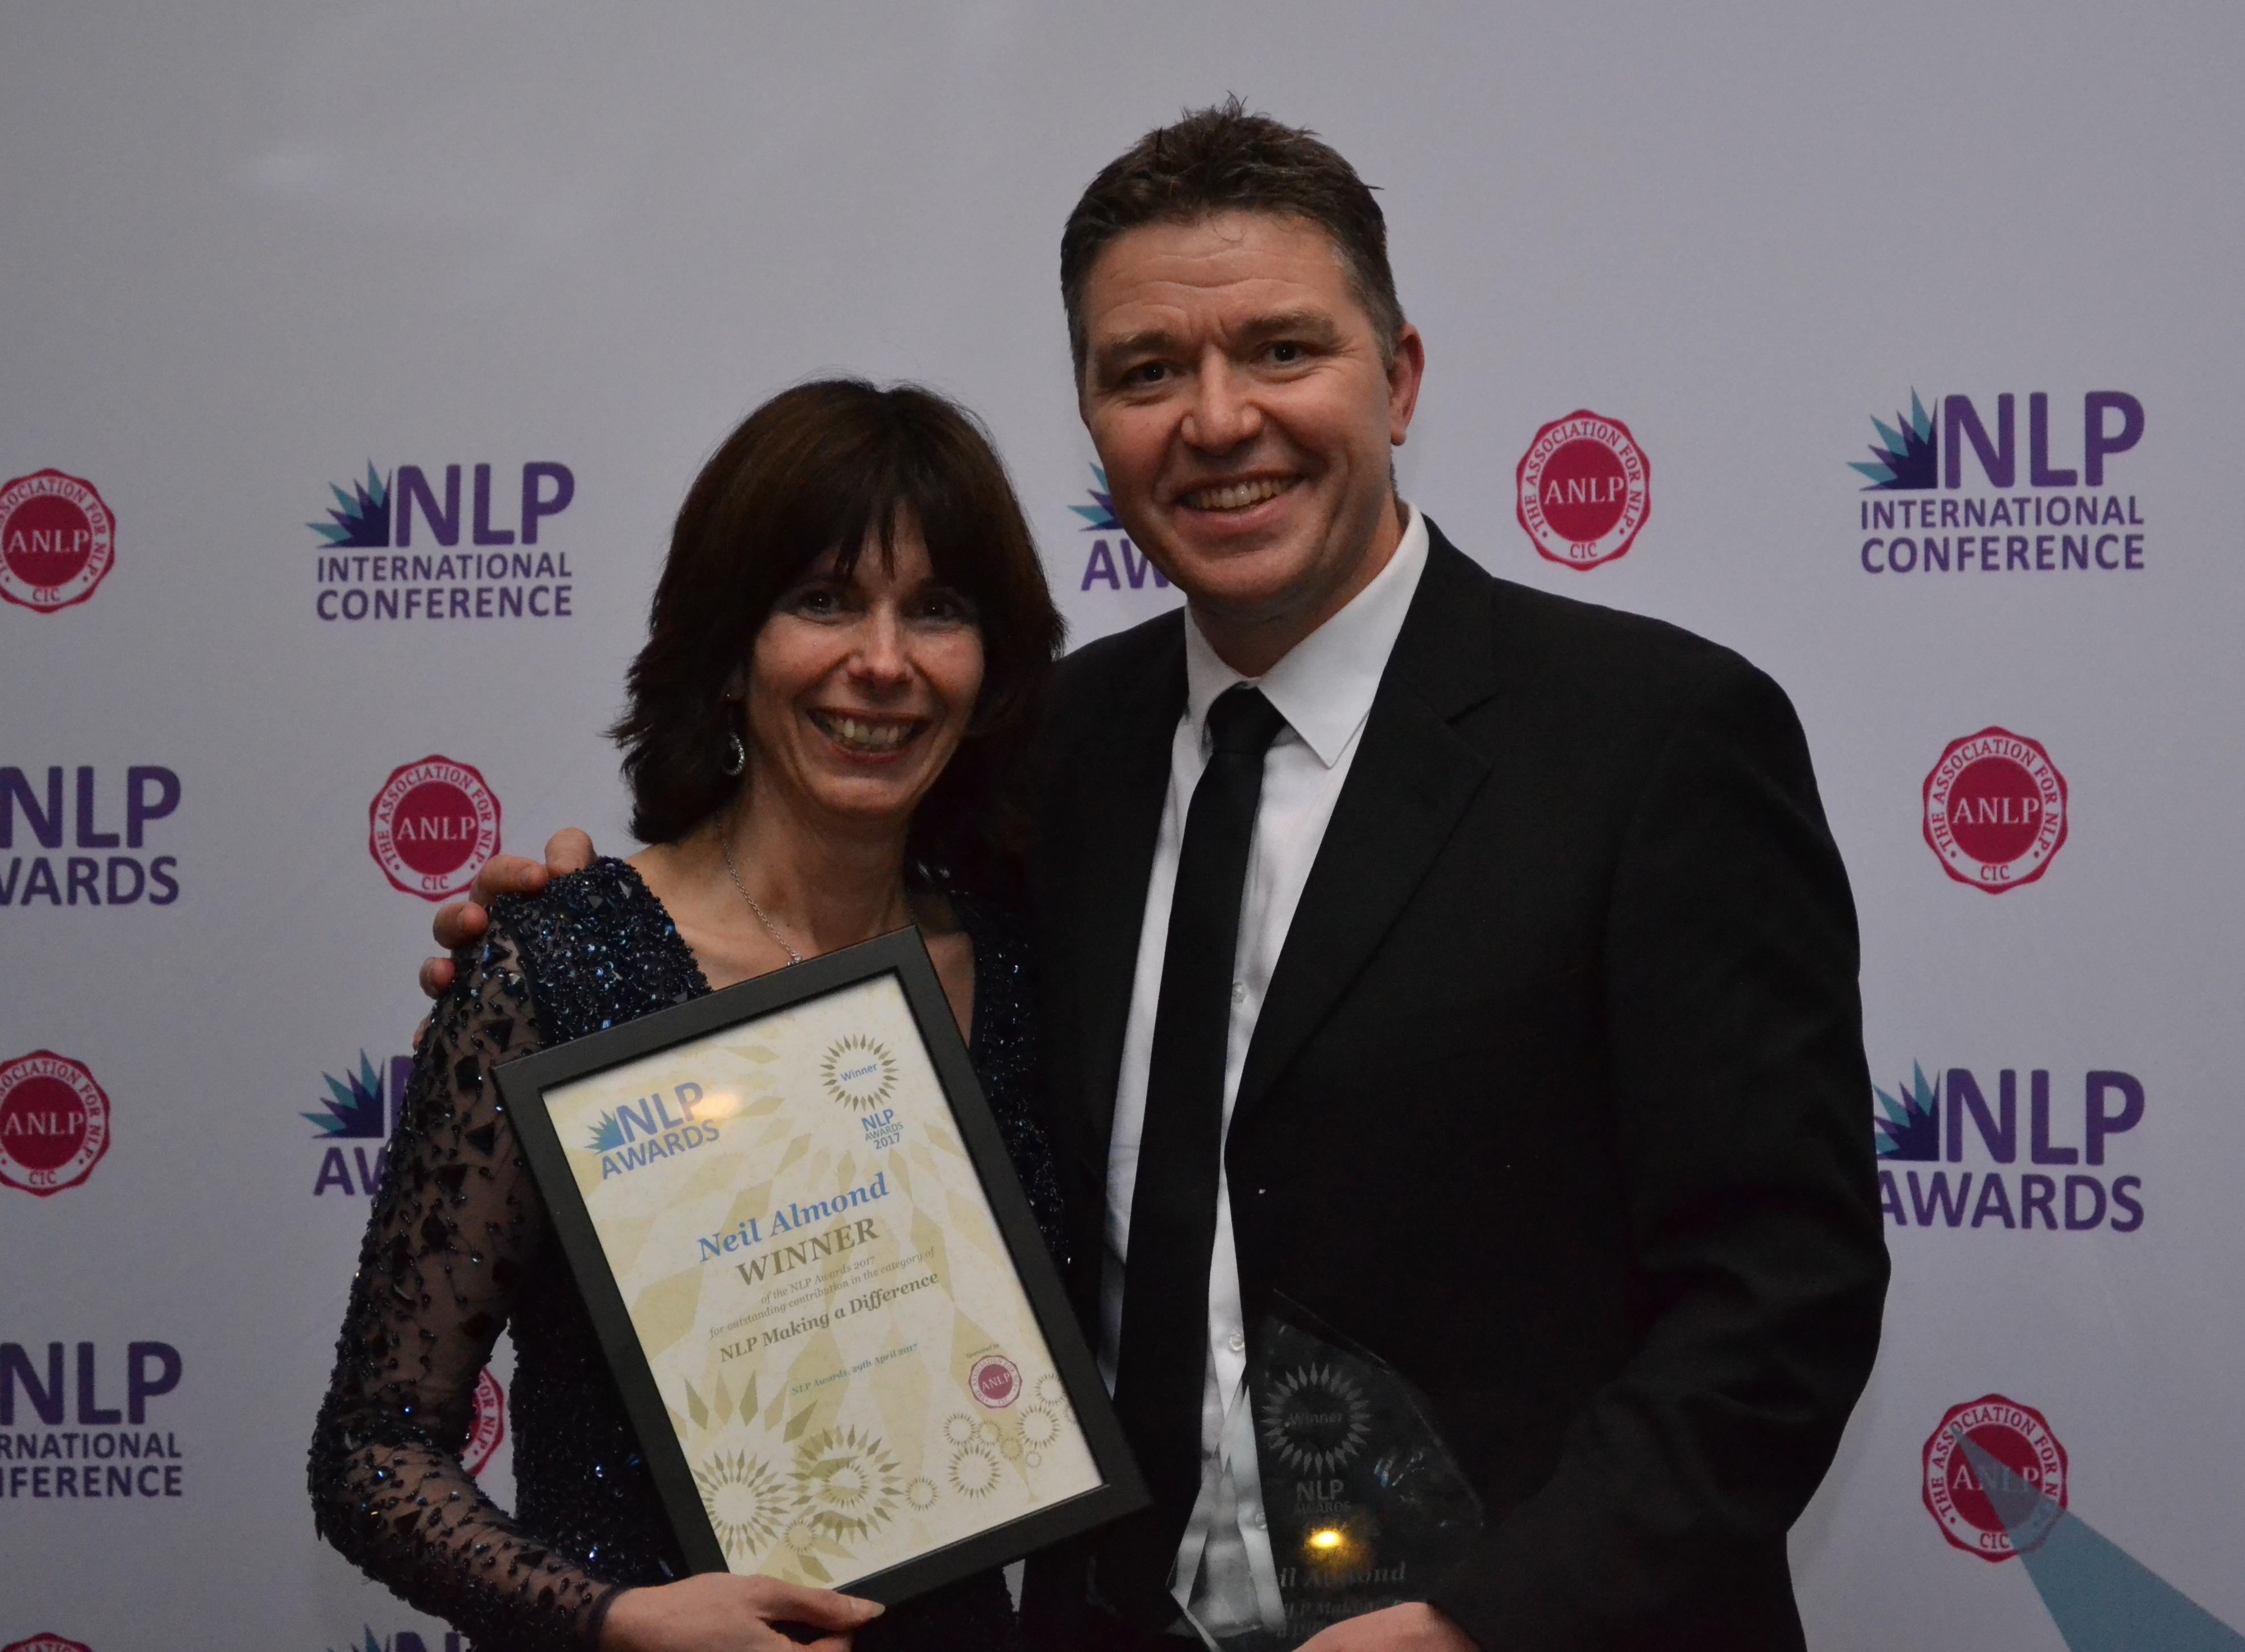 NLP Award Winner 2017